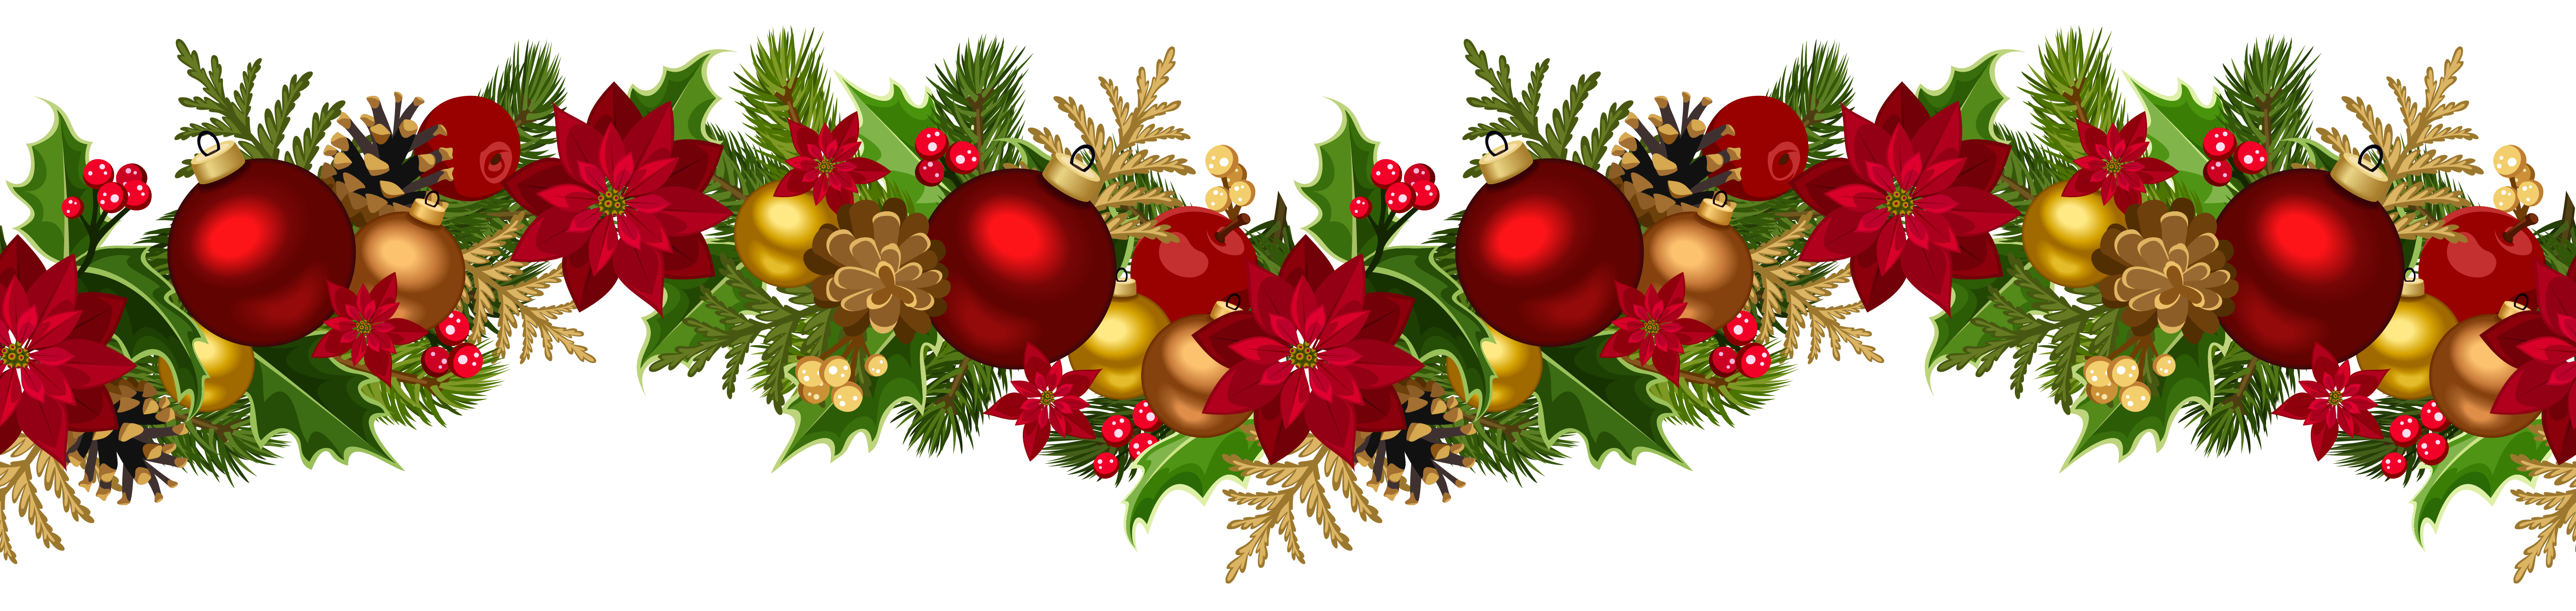 Christmas Decorative Garland PNG Clip Art Image | design ...